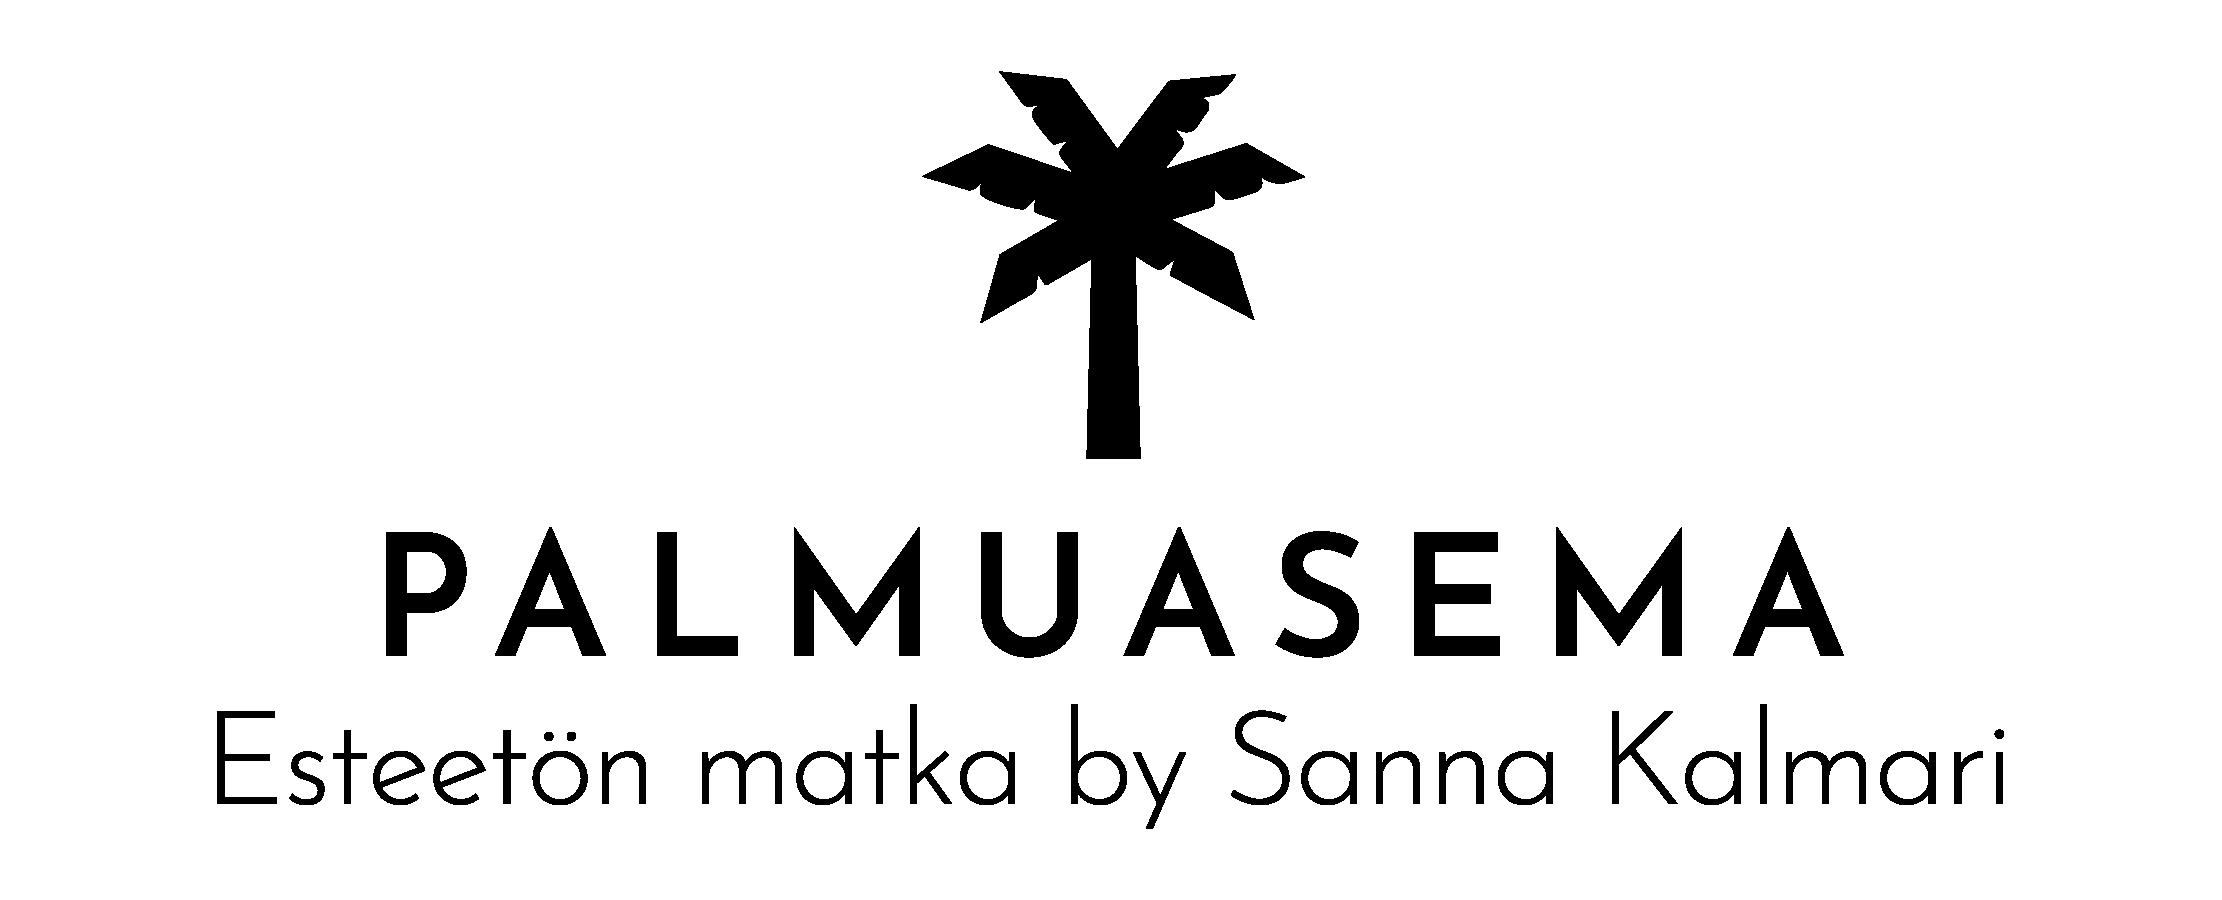 Palmuasema